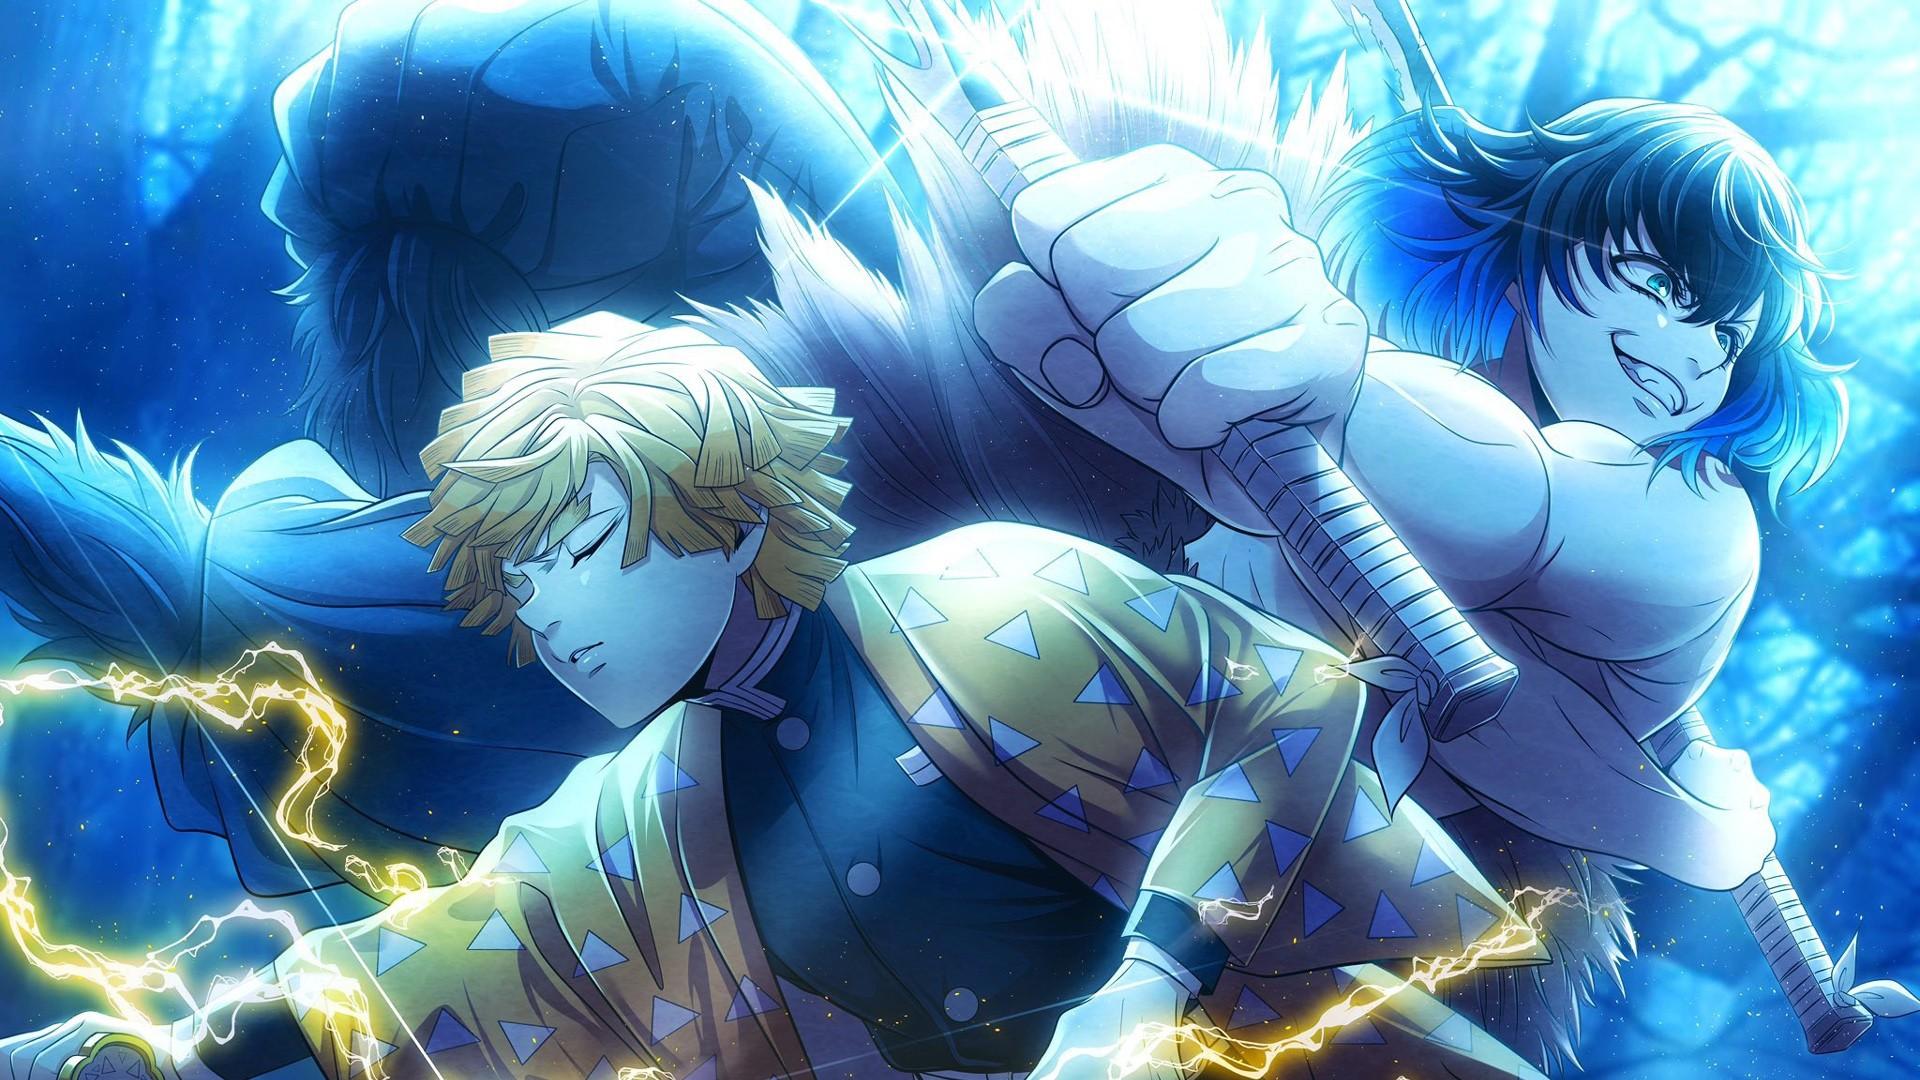 Looking for the best anime wallpaper ? Demon Slayer Inosuke Hashibira Zenitsu Agatsuma HD Anime ...